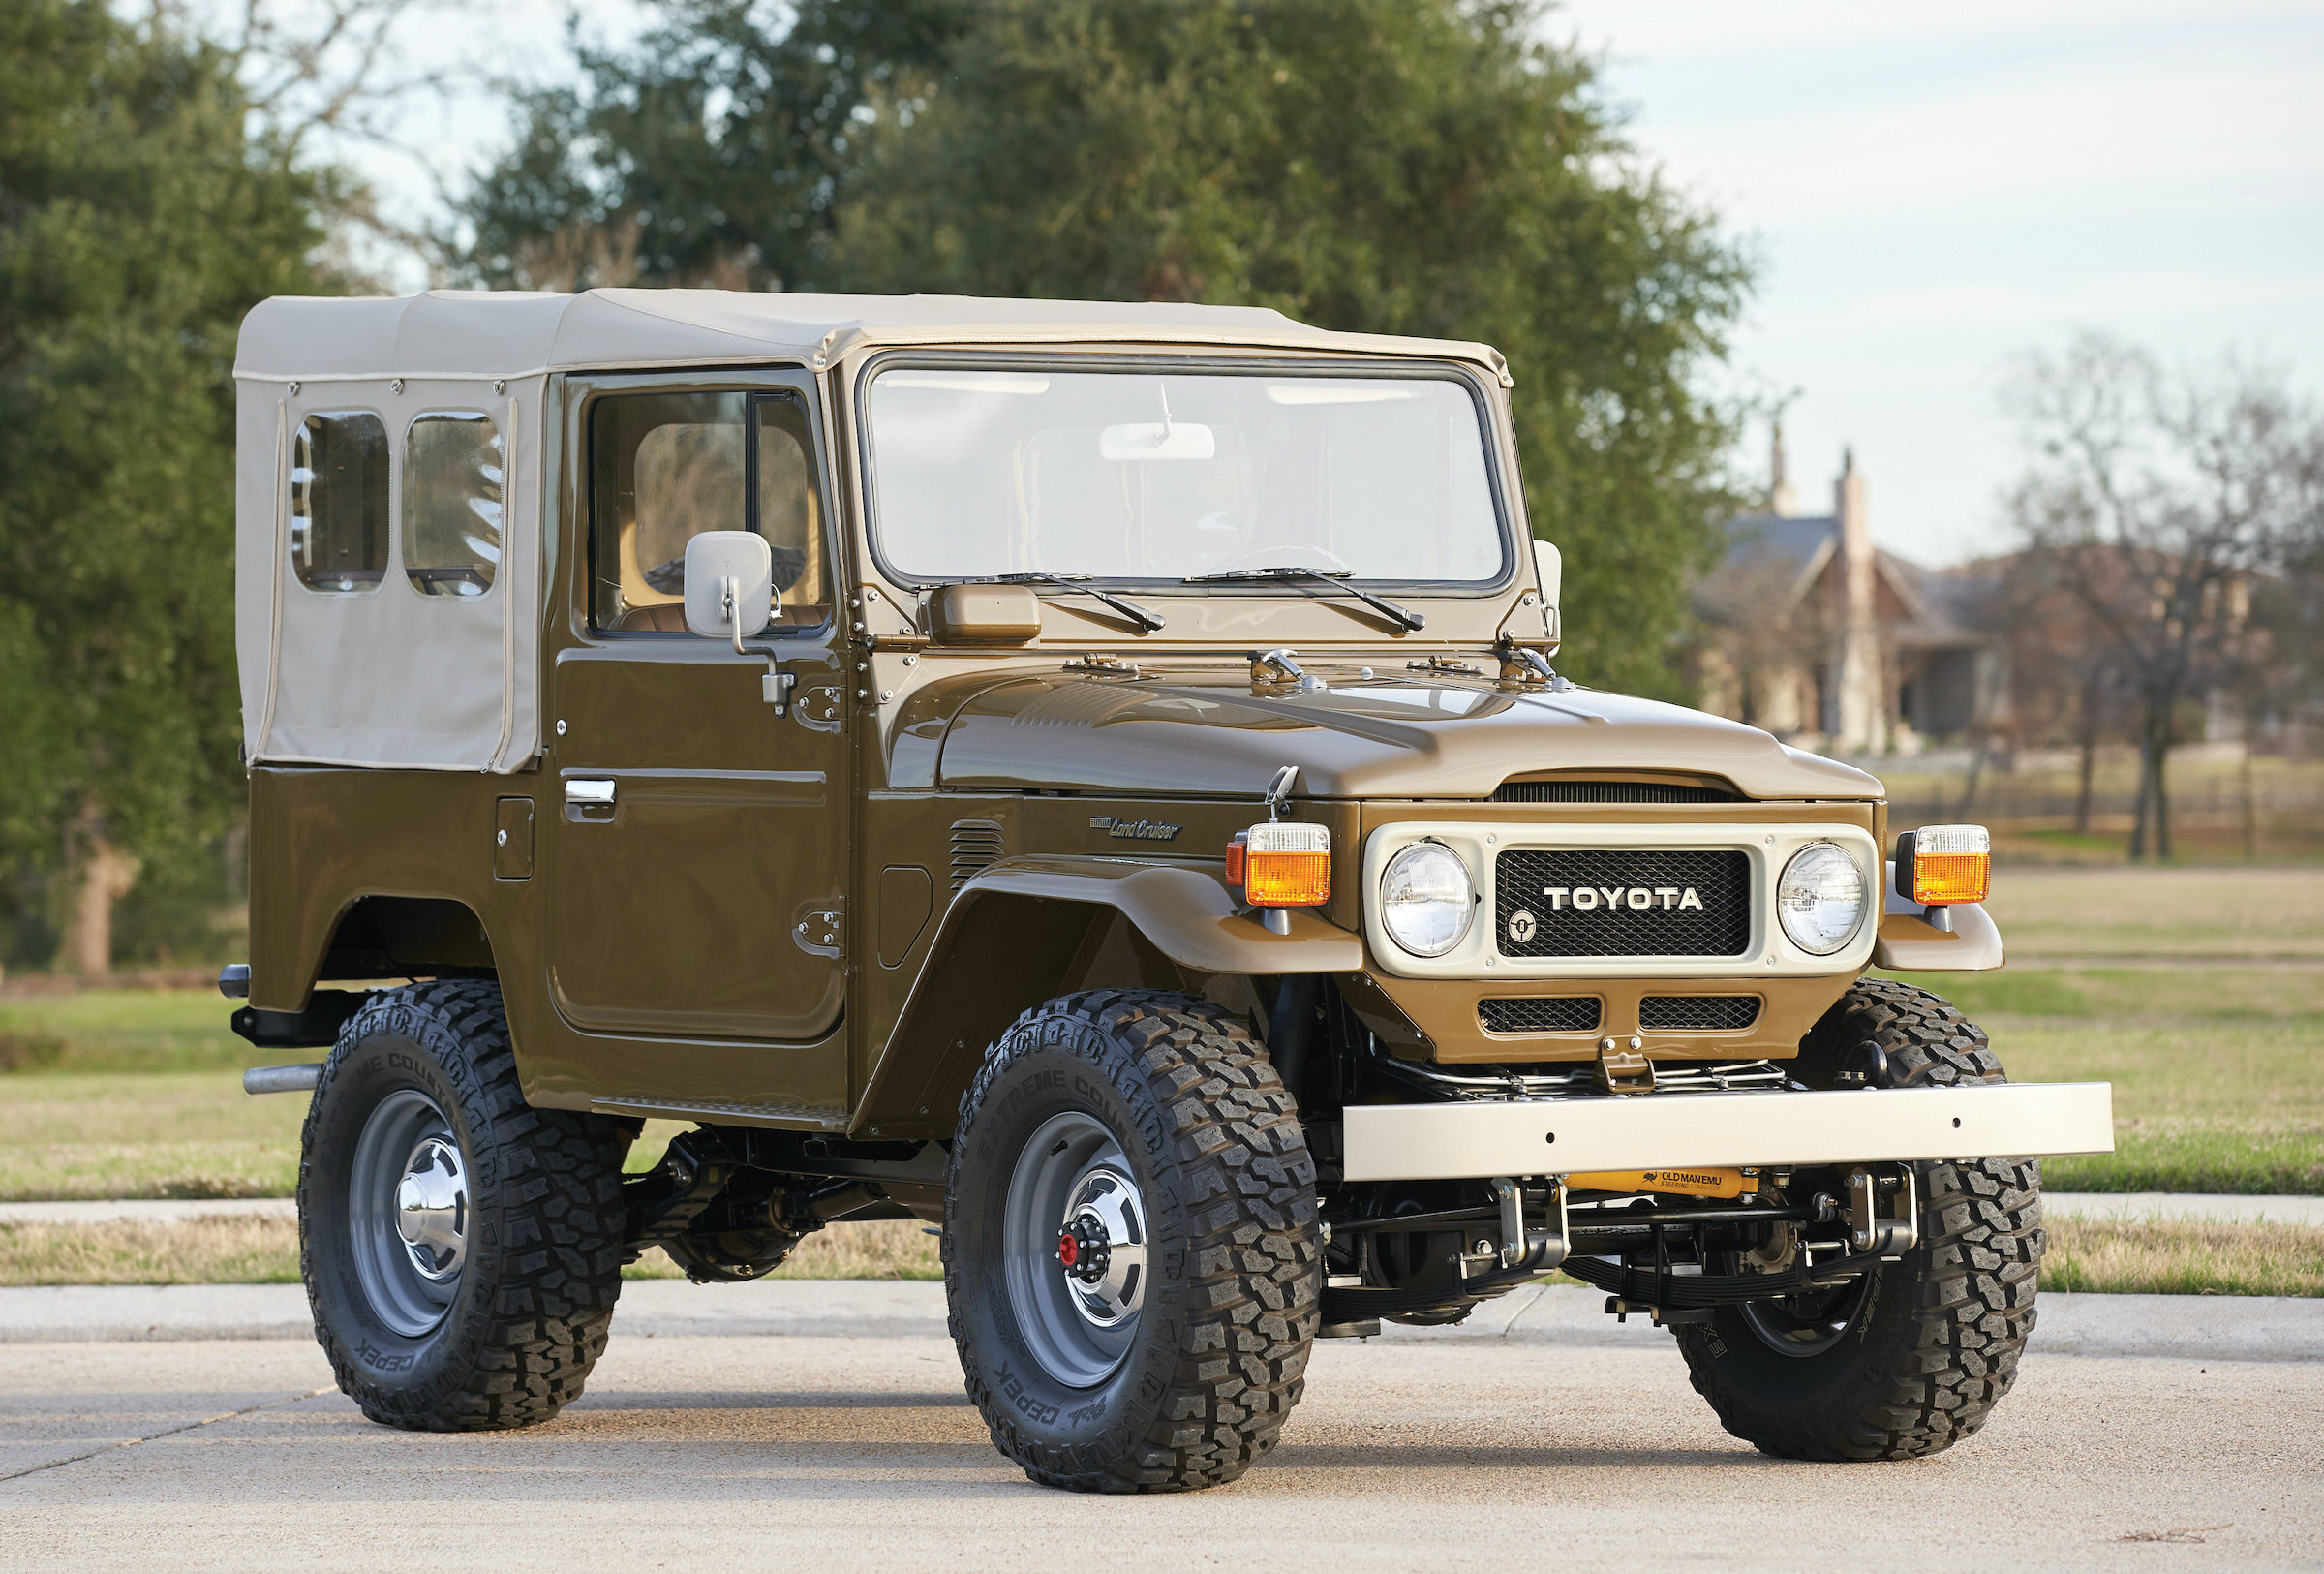 Kelebihan Jeep Land Cruiser Murah Berkualitas